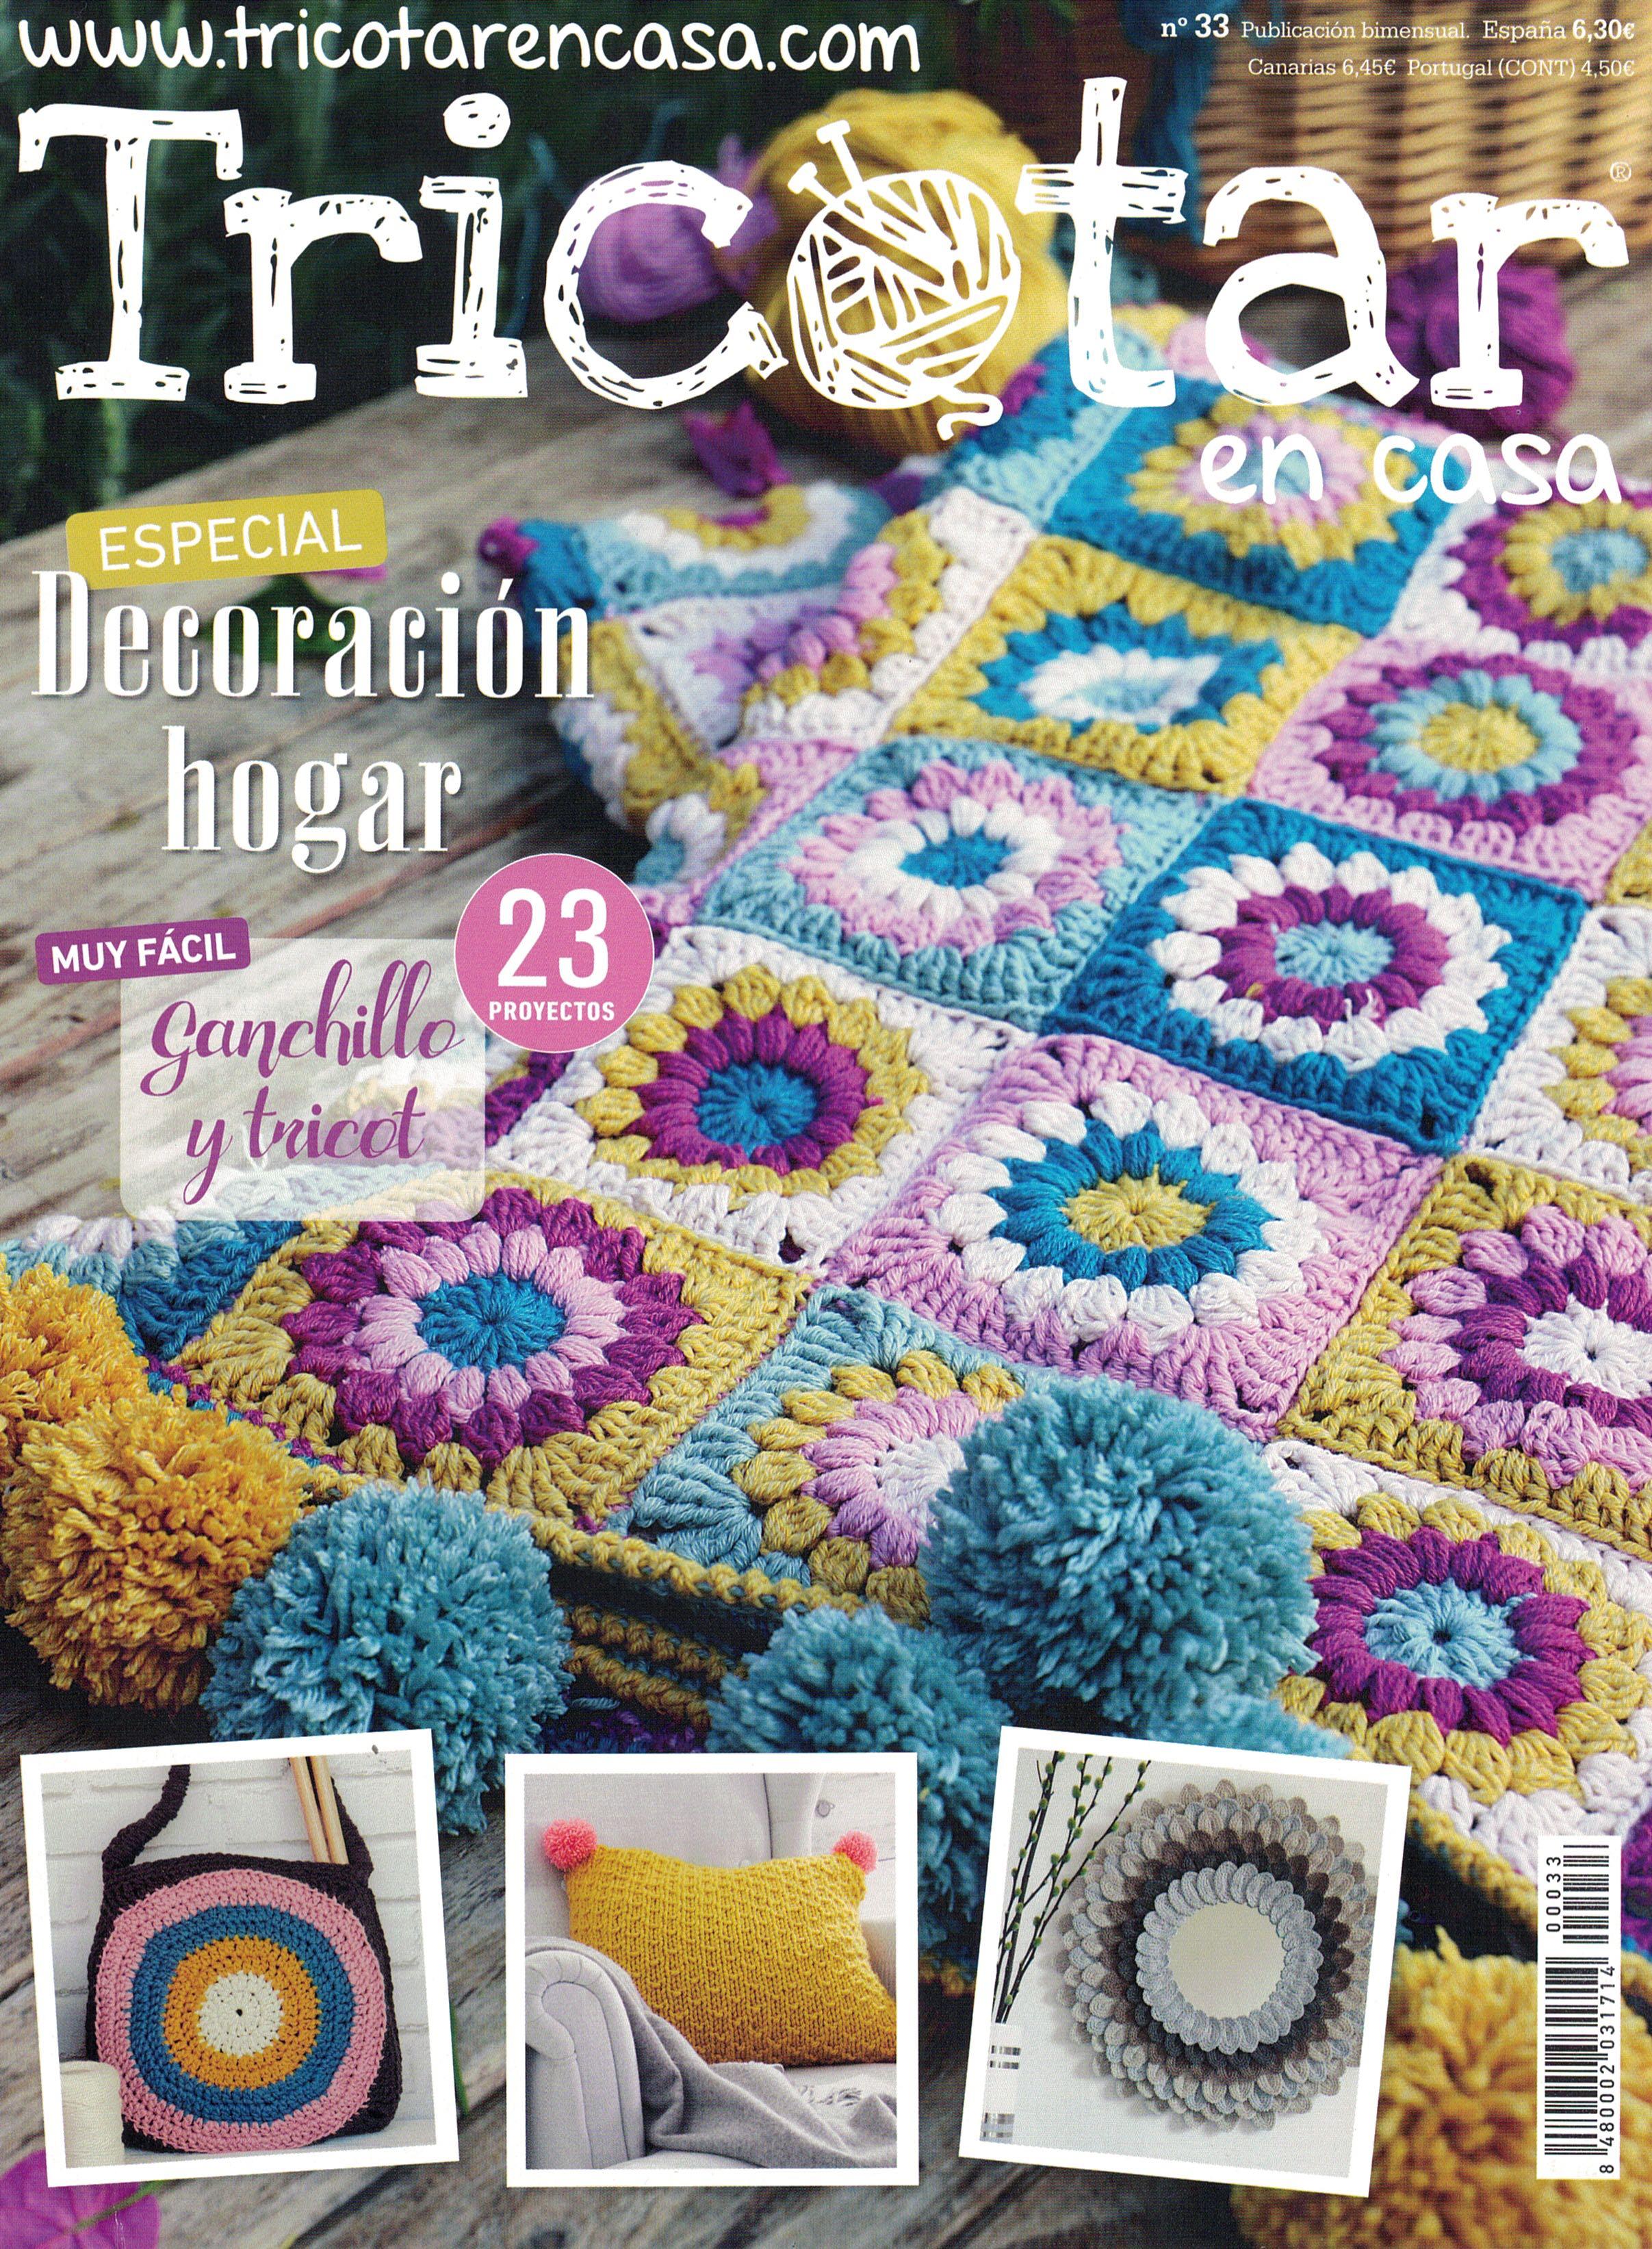 Revista tricotar en casa